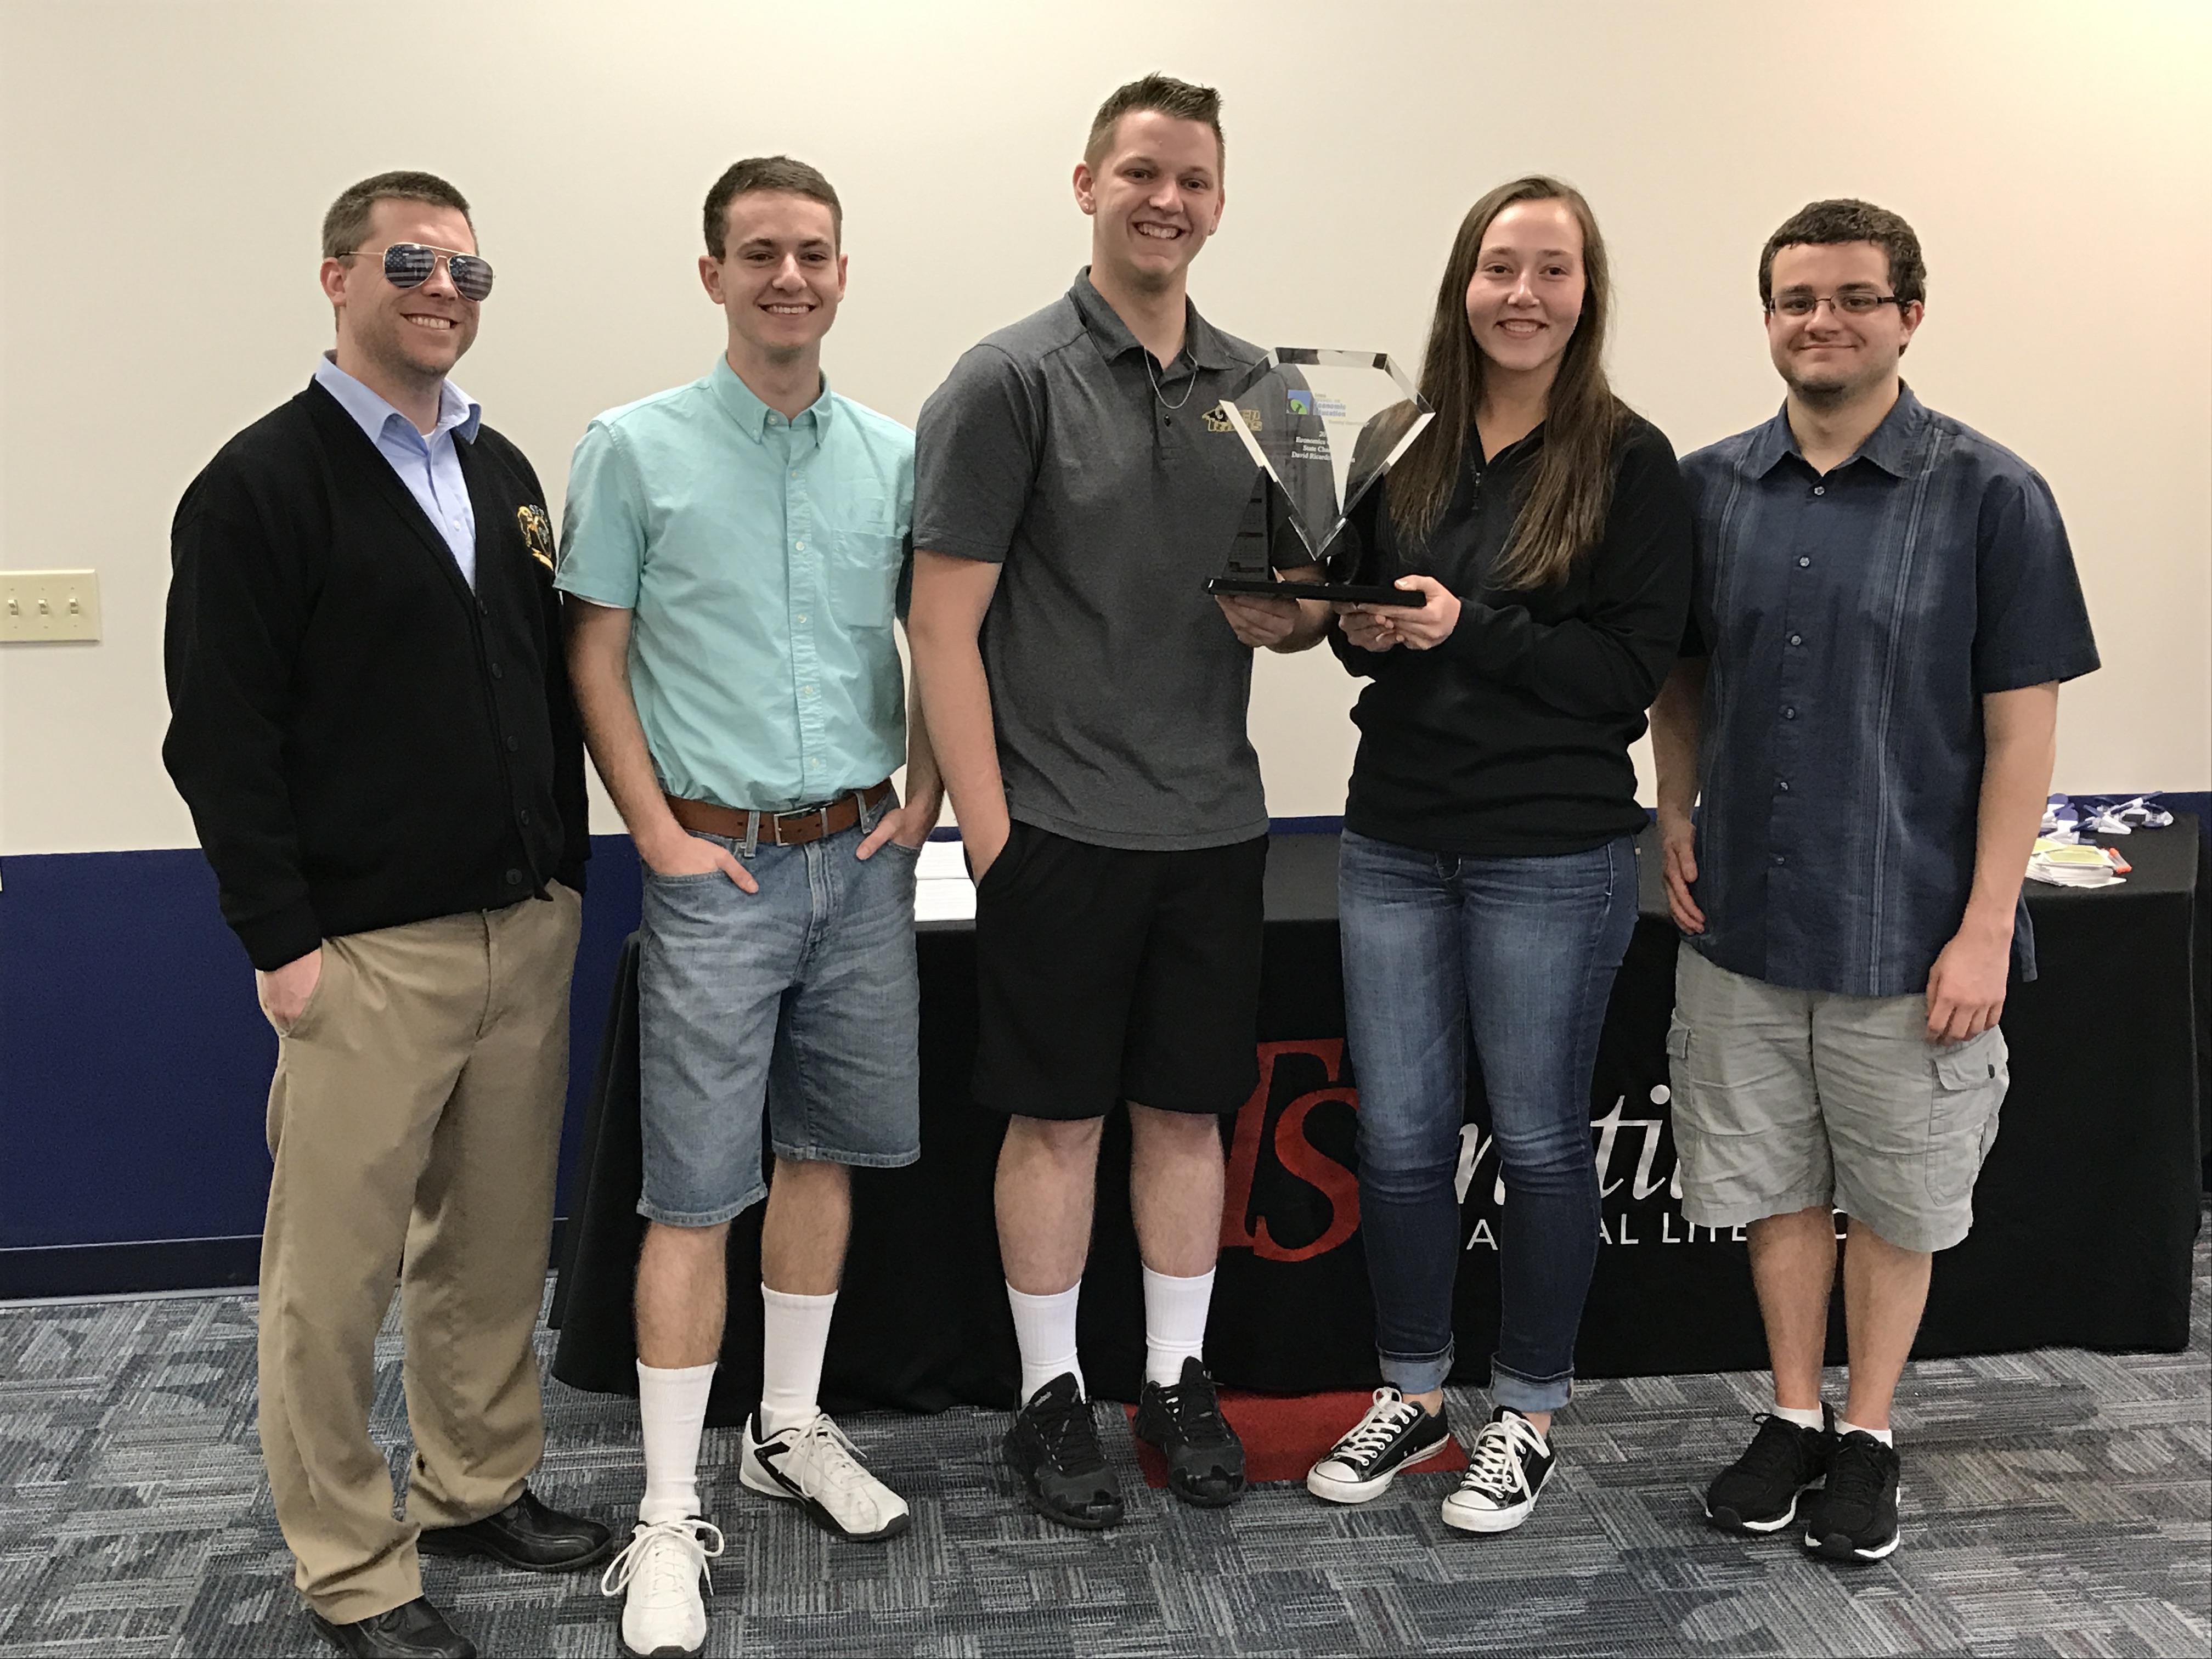 Southeast Polk High School. Pictured are teacher Mike Johnson, students Owen Fischer, Talen Birchmier, Dyllan Johnson, and Jacob Veatch.